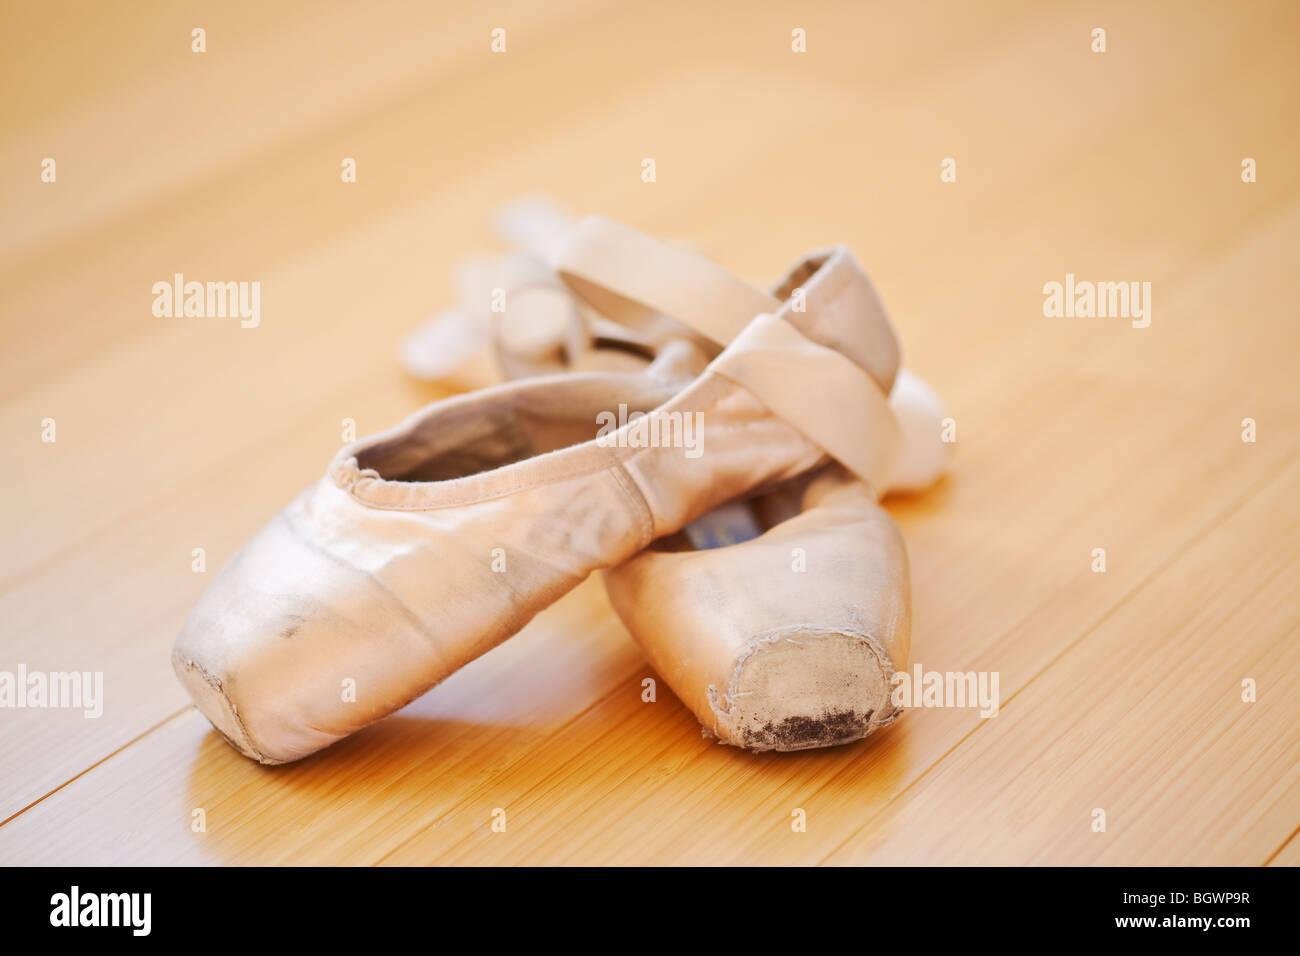 7a3b455d6 Worn Ballet Shoes Stock Photos   Worn Ballet Shoes Stock Images - Alamy